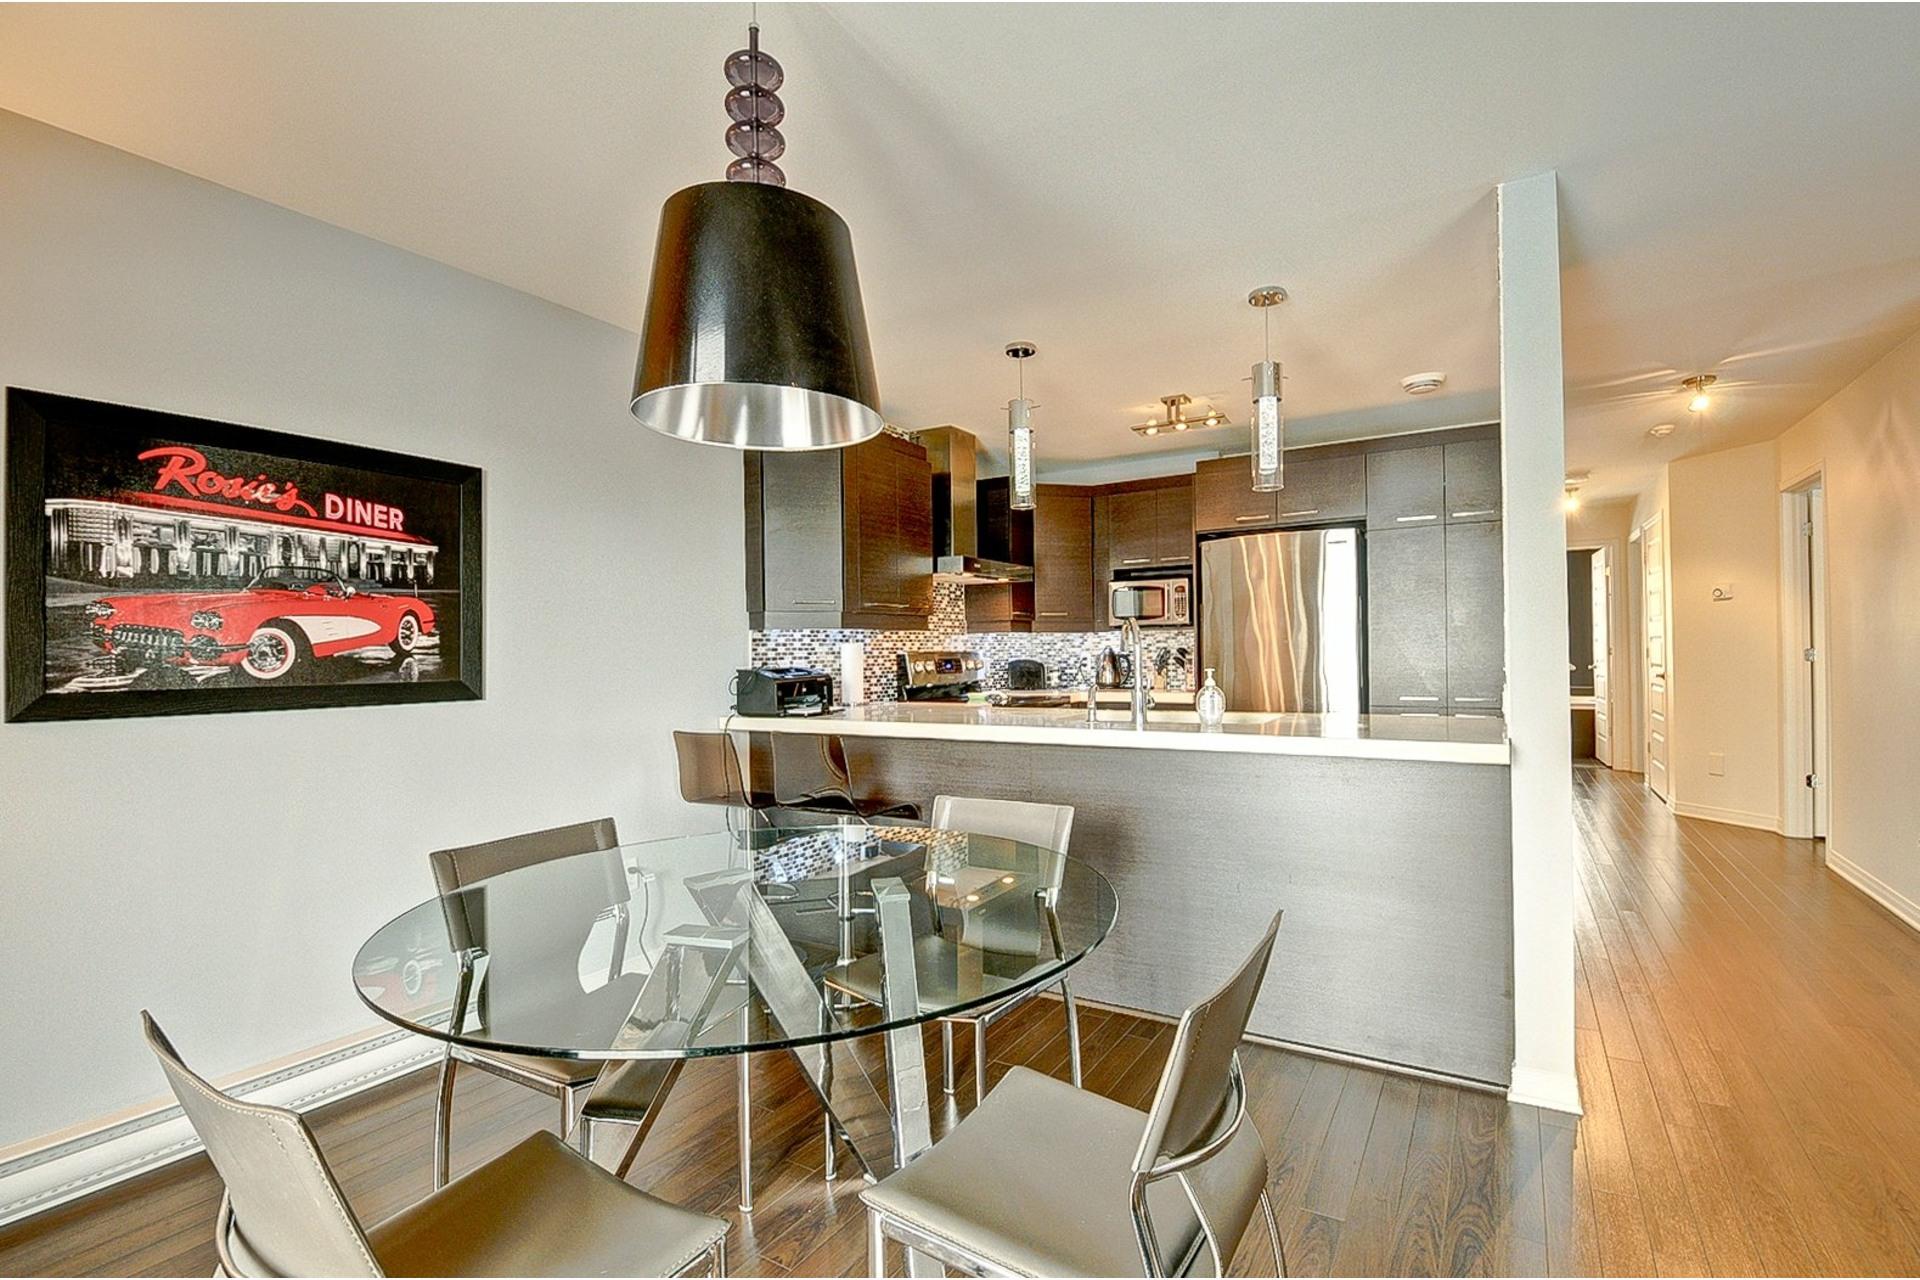 image 4 - Apartment For sale Vaudreuil-Dorion - 7 rooms